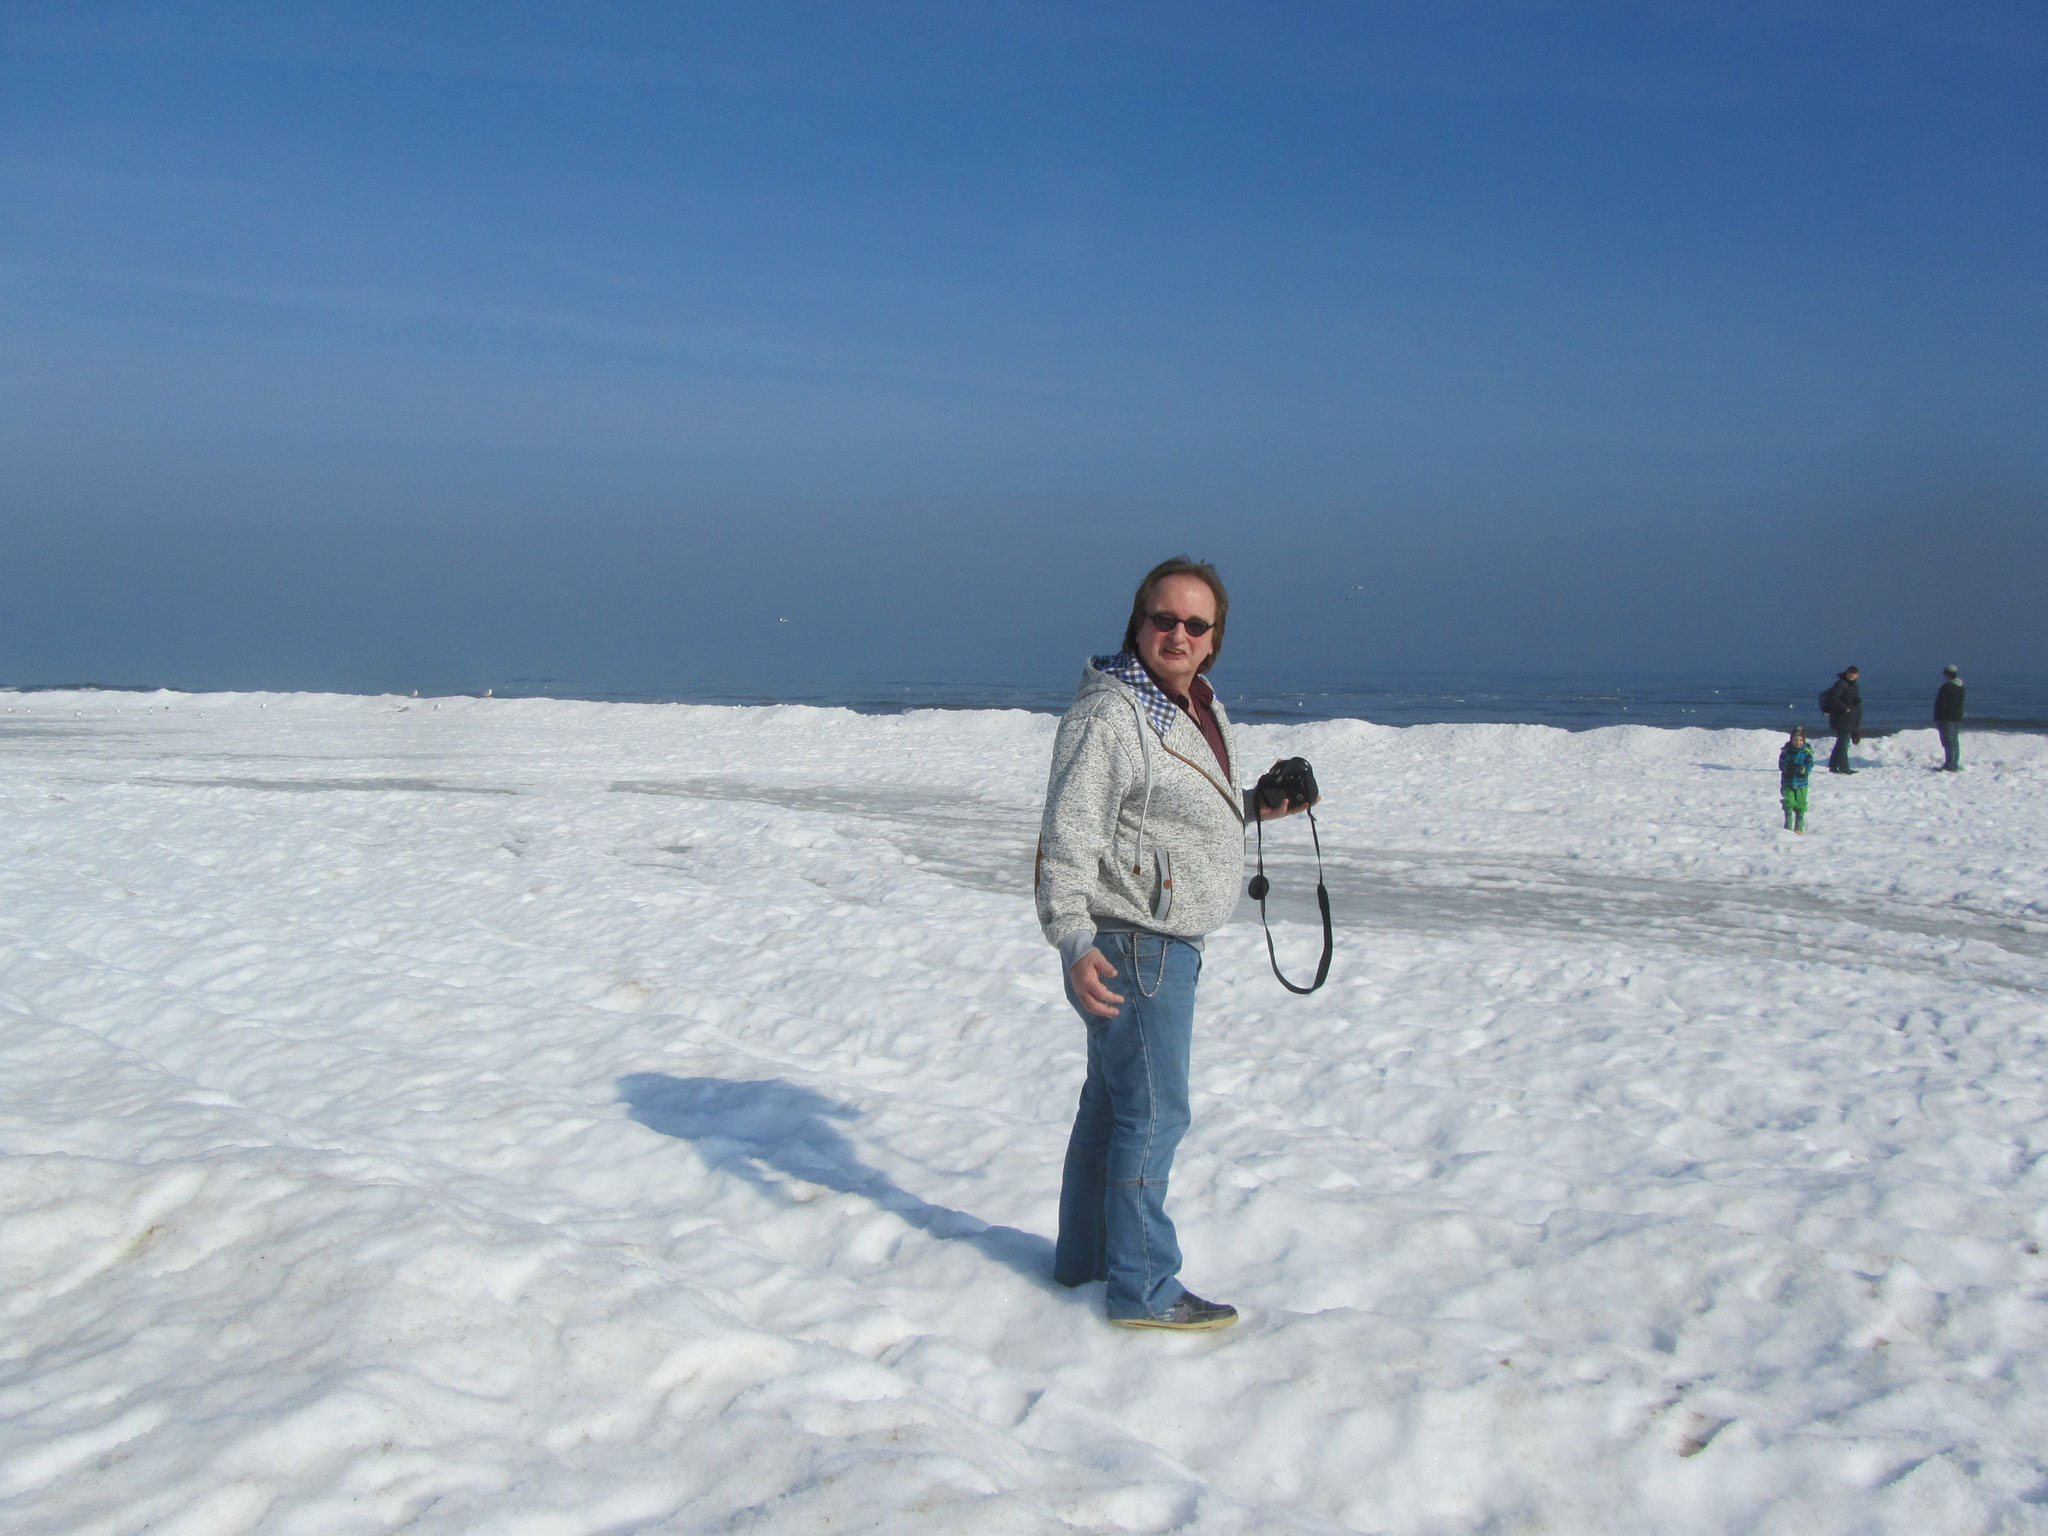 Schnee statt Sand am Strand